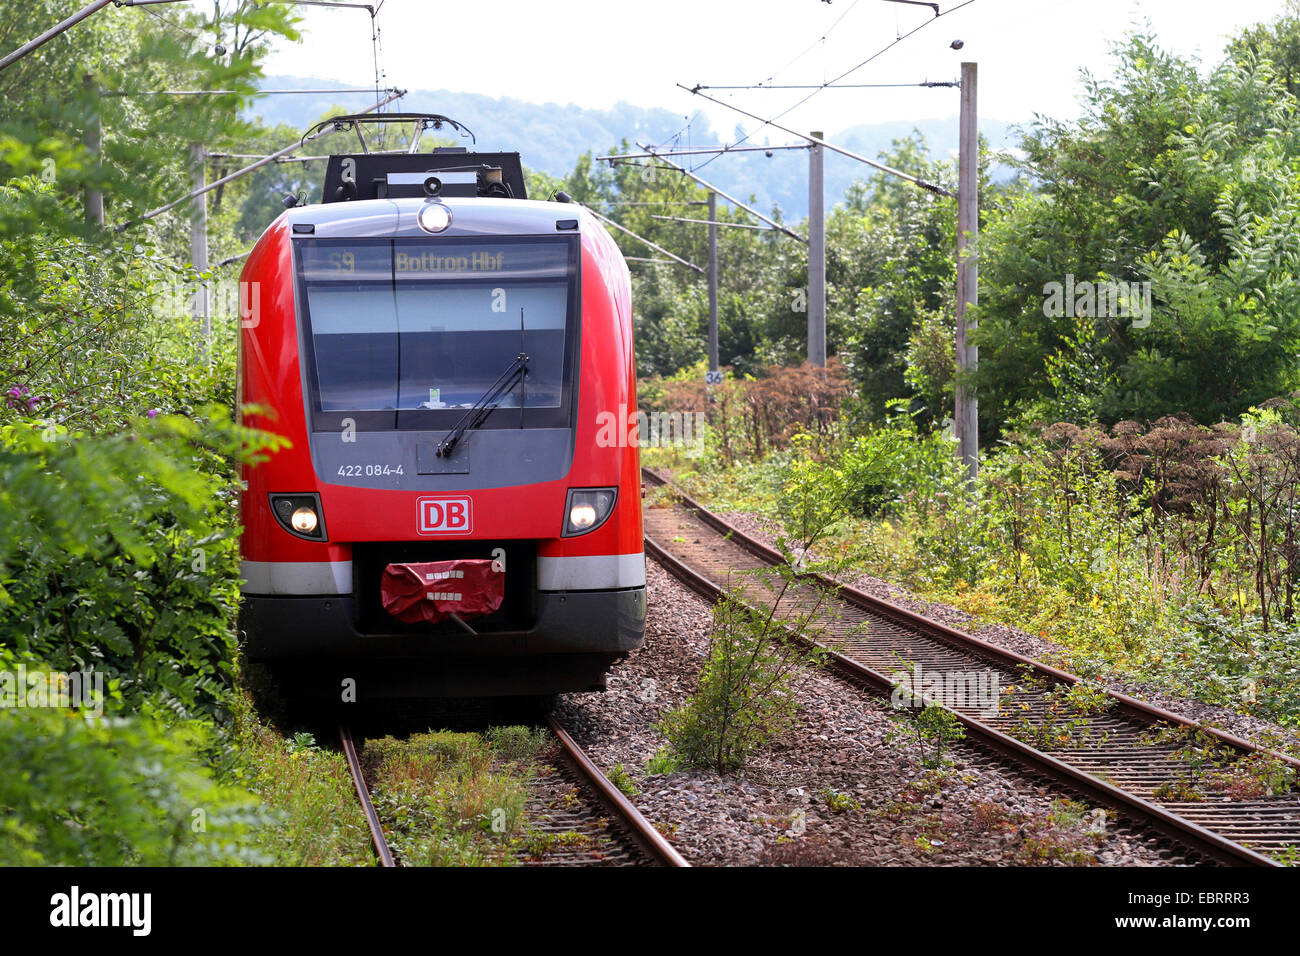 city railway on overgrown railtracks, Germany - Stock Image